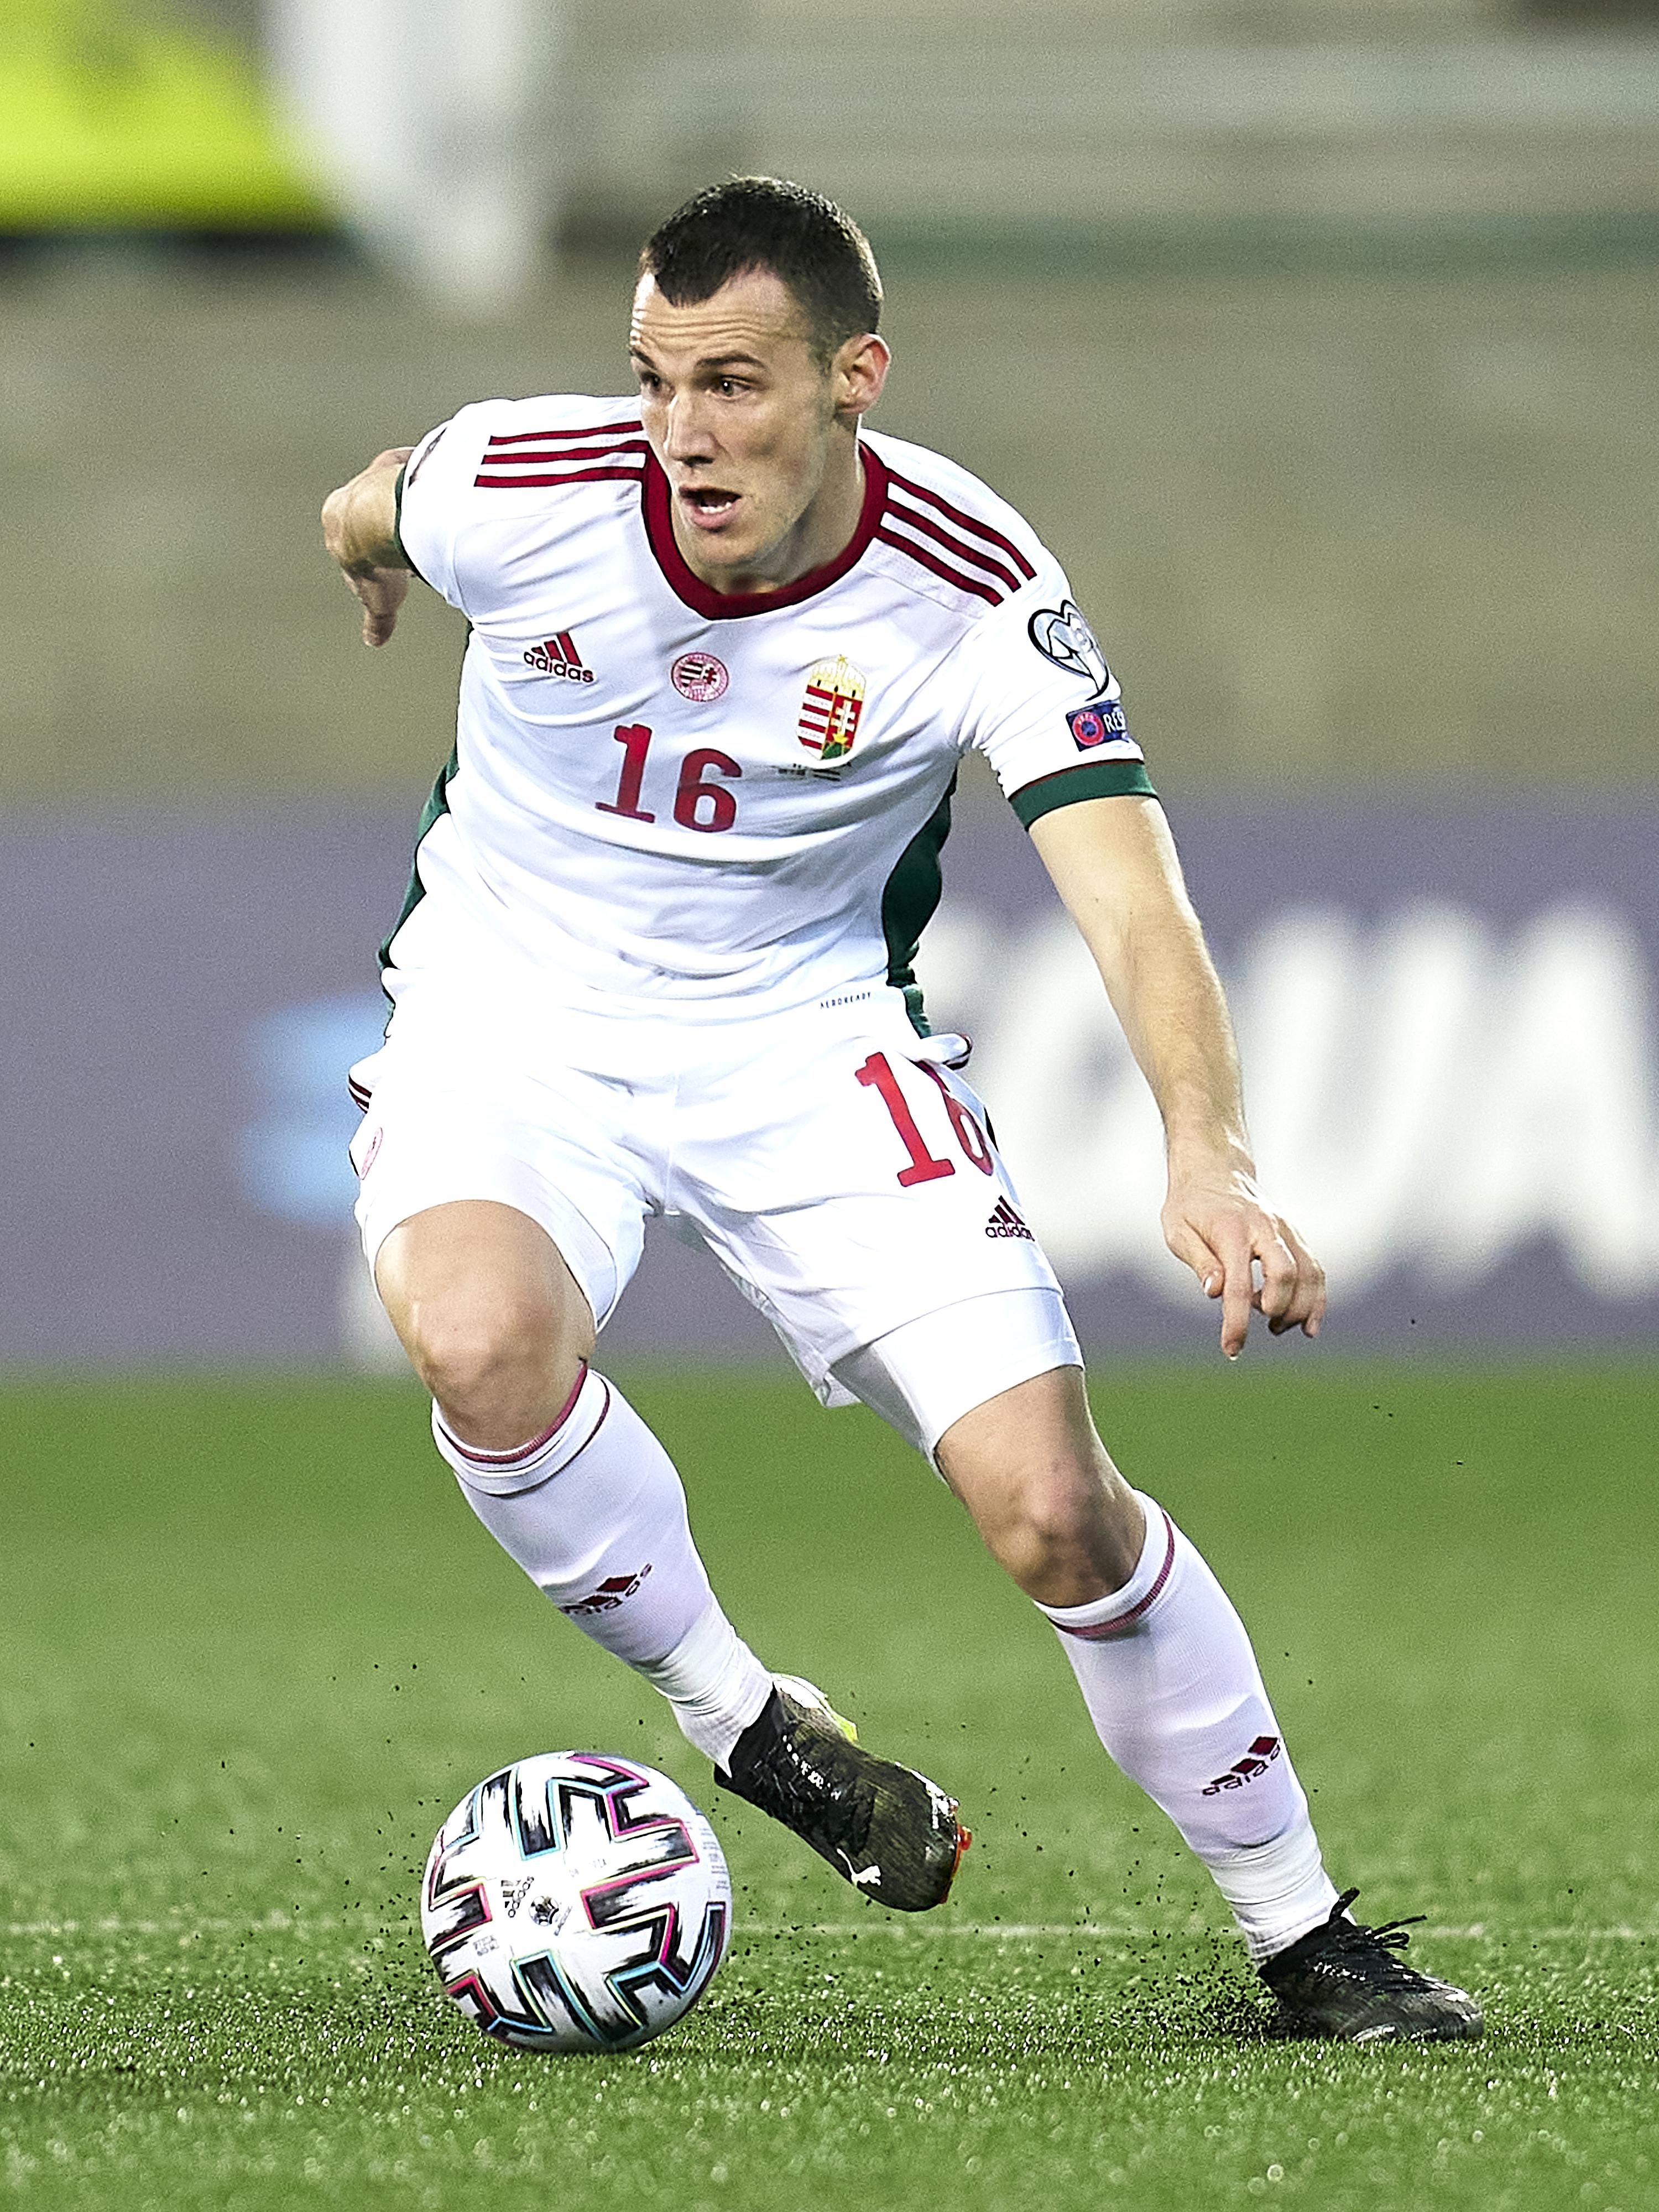 Andorra v Hungary - FIFA World Cup 2022 Qatar Qualifier